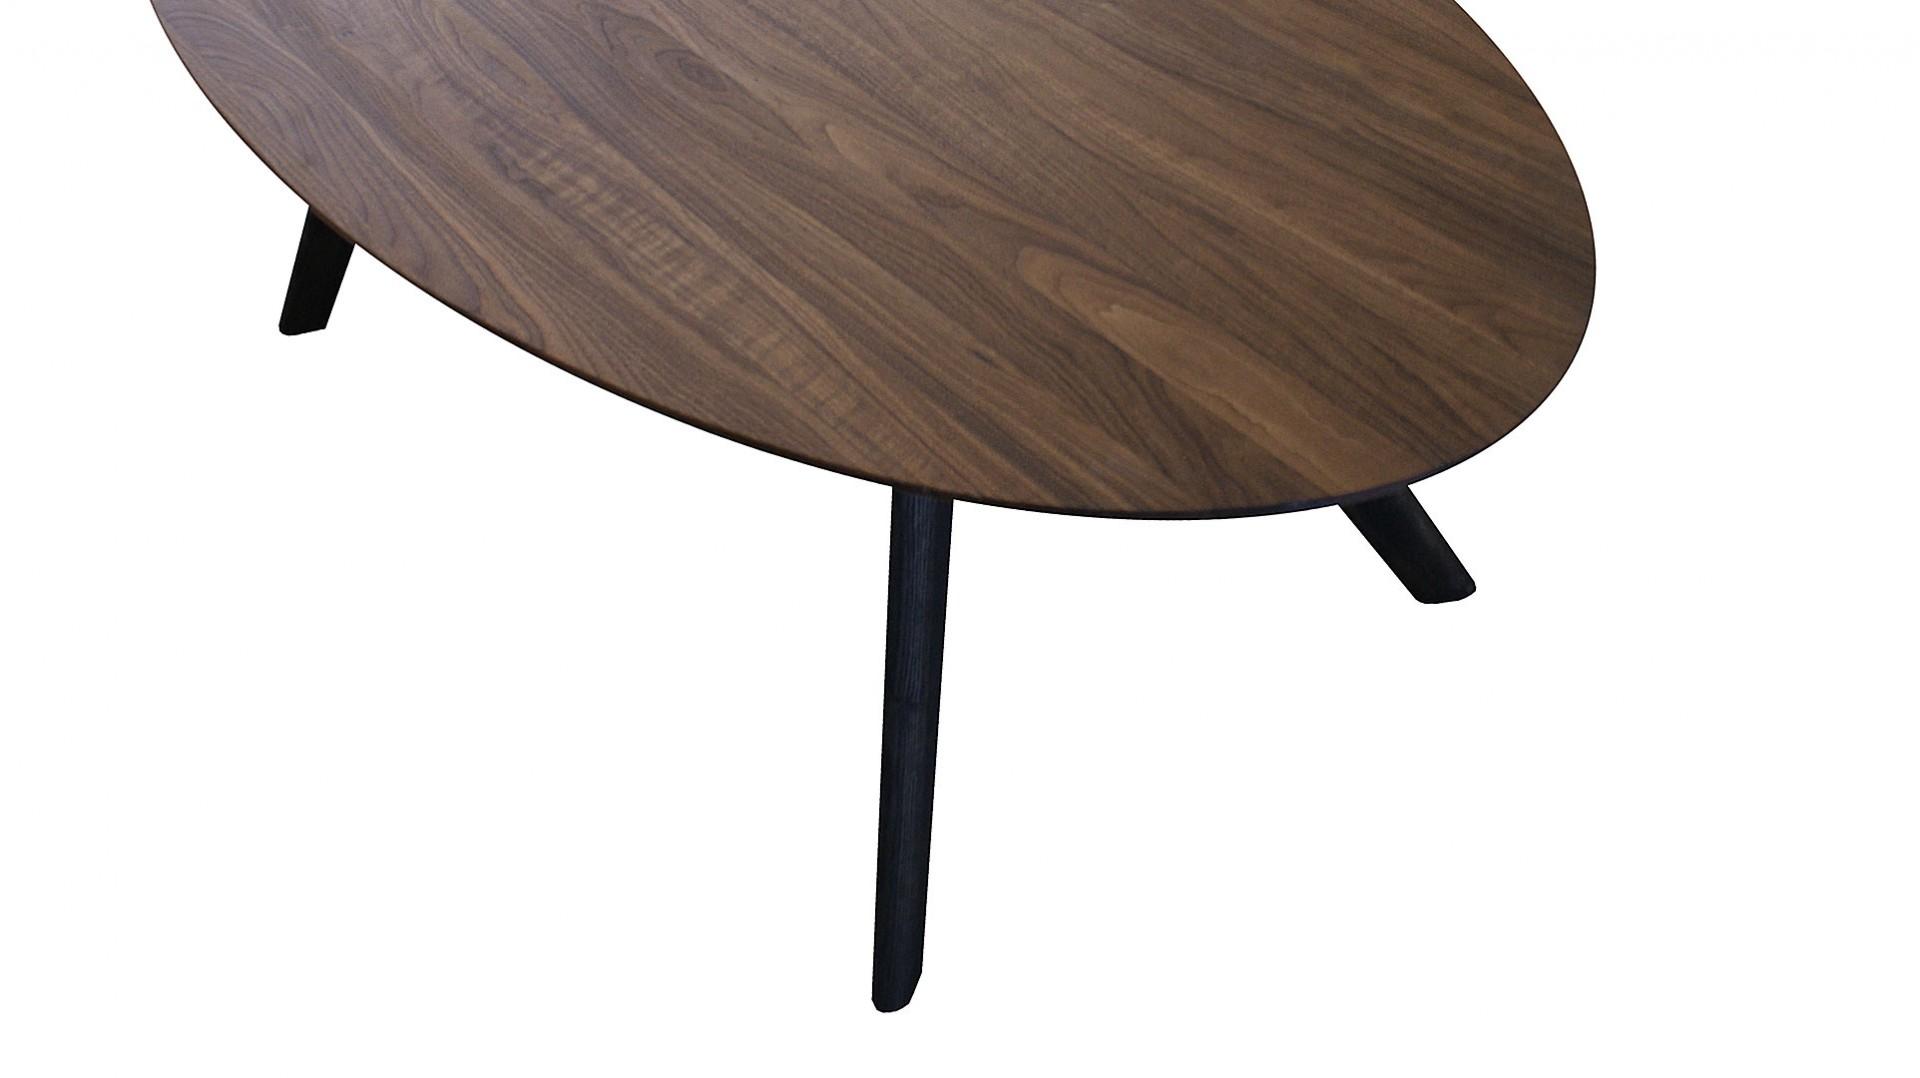 Jedálenský stôl ELYS, masívny orech, jedálenský stôl z masívneho dreva, jedálenský stôl cubica, masívny drevený stôl